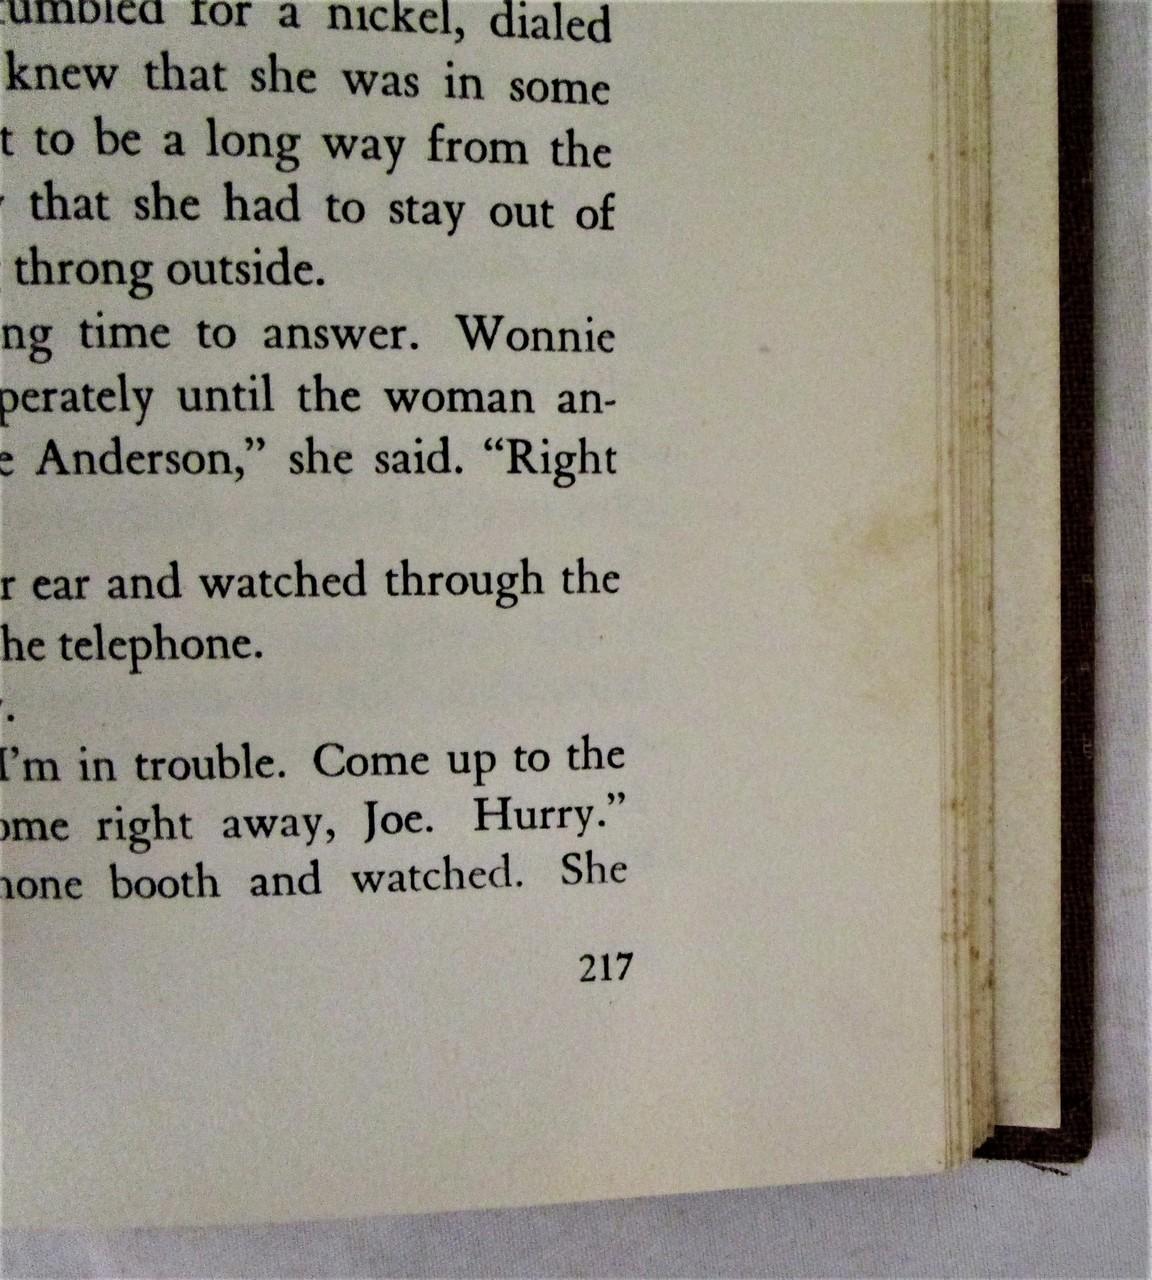 THIRD WARD NEWARK, by Curtis Lucas - 1946 [1st Ed]